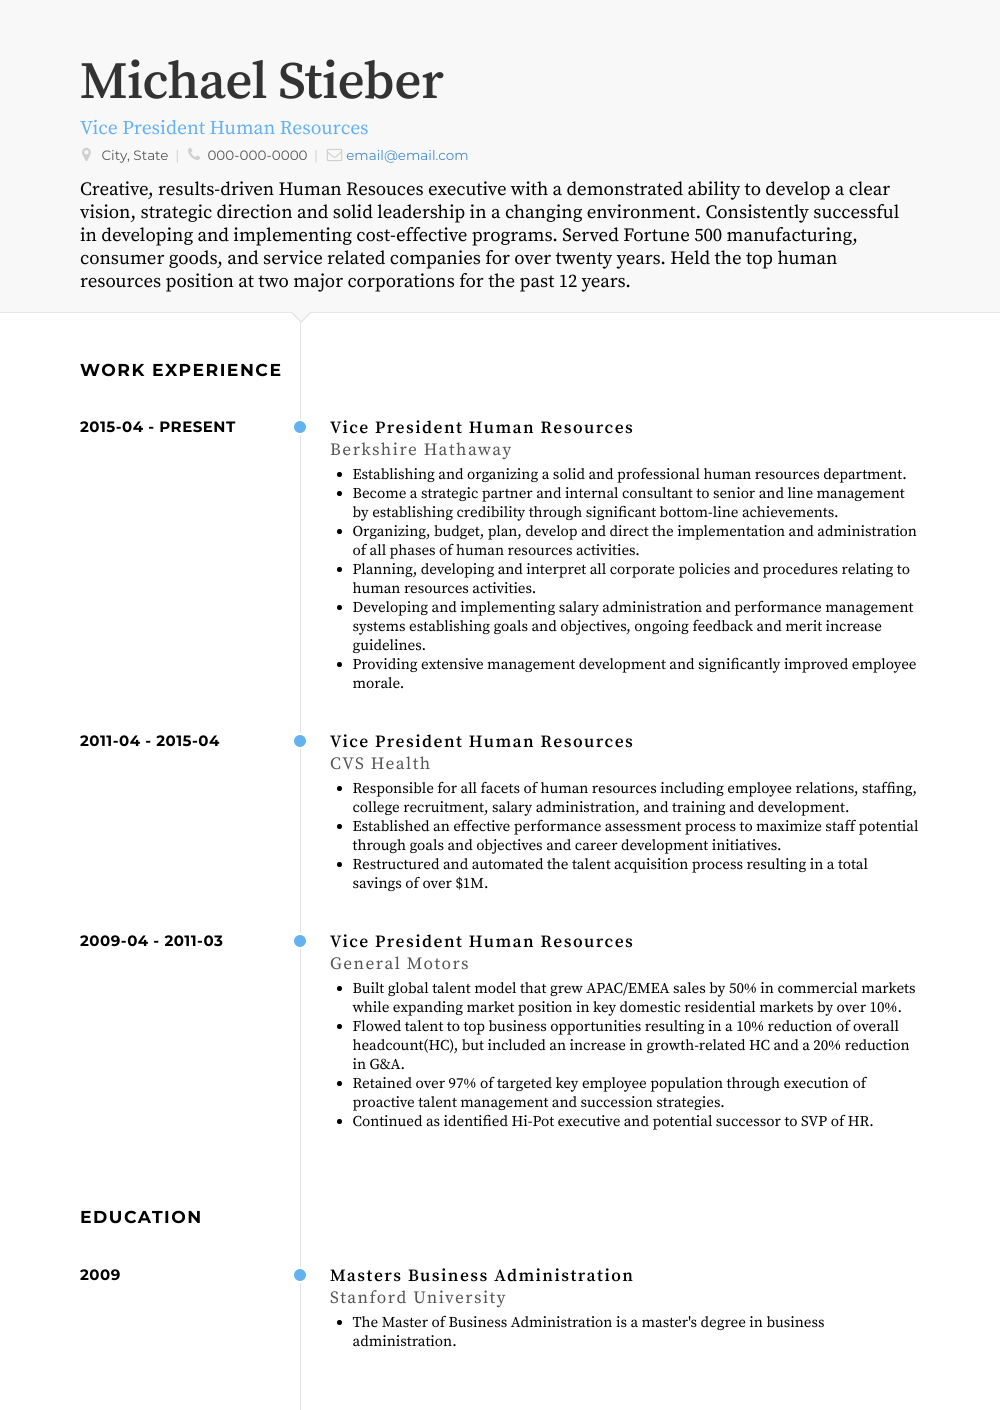 Human Resources - Resume Samples & Templates | VisualCV